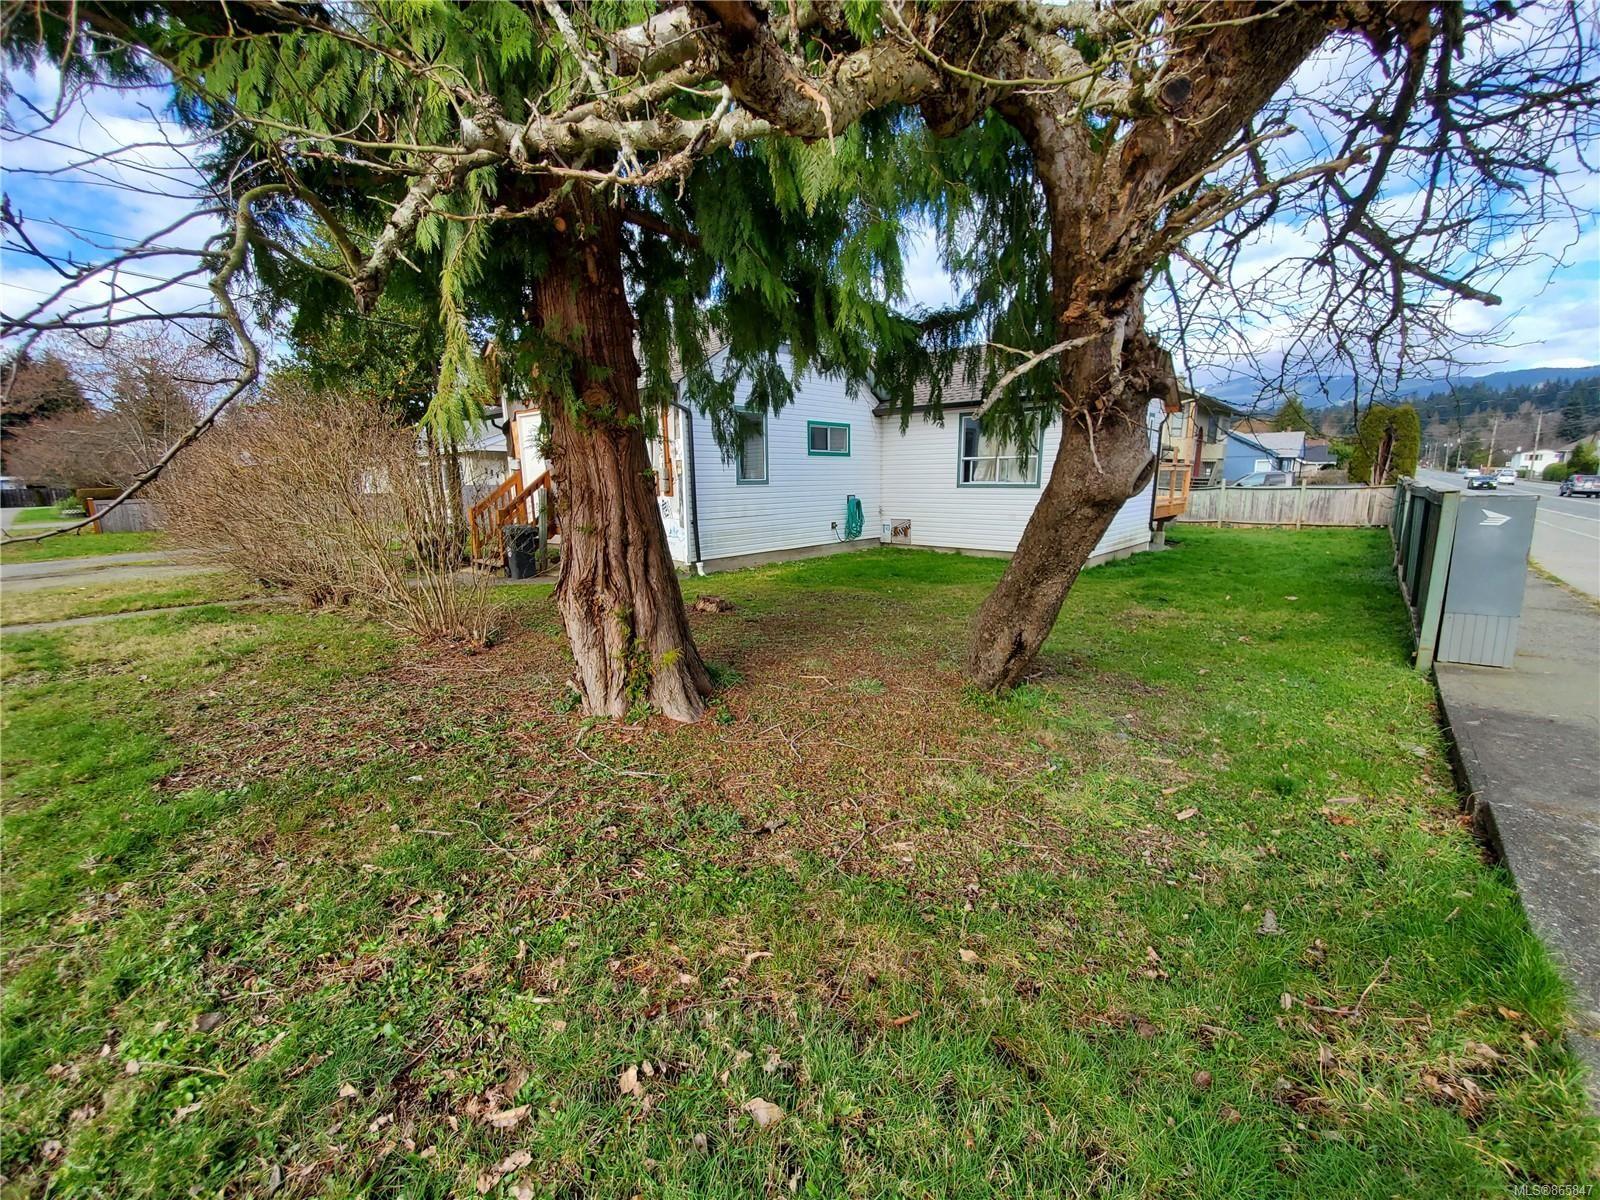 Main Photo: 4913 Lathom Rd in : PA Port Alberni House for sale (Port Alberni)  : MLS®# 865847